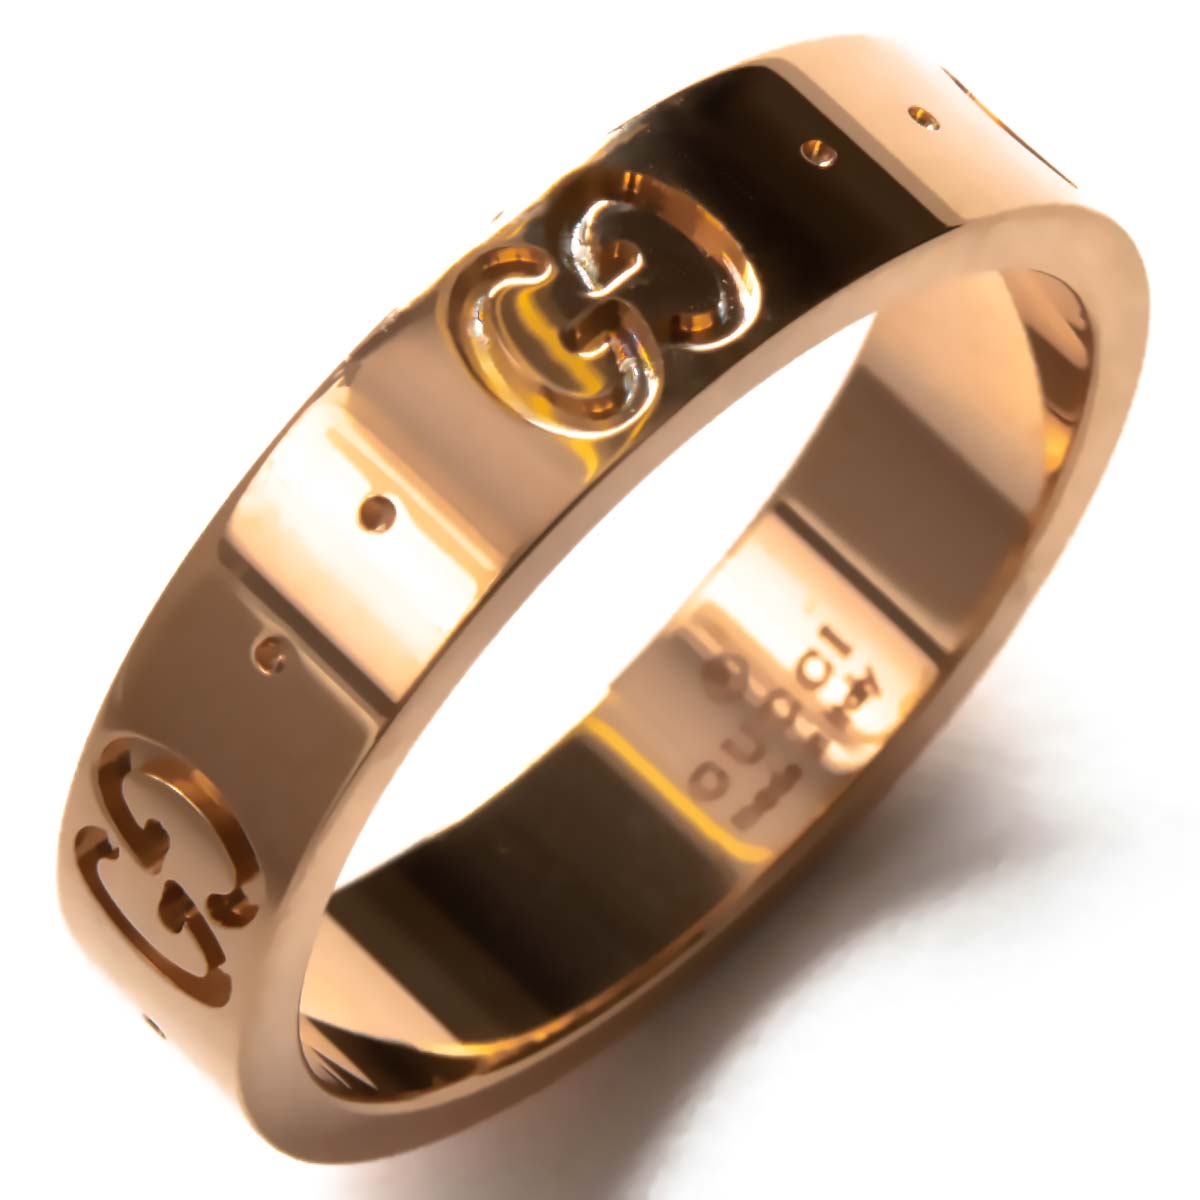 d553765f53c9 グッチ リング【指輪】 アクセサリー メンズ レディース GGアイコン ピンクゴールド 152045 J8500 5702 GUCCI